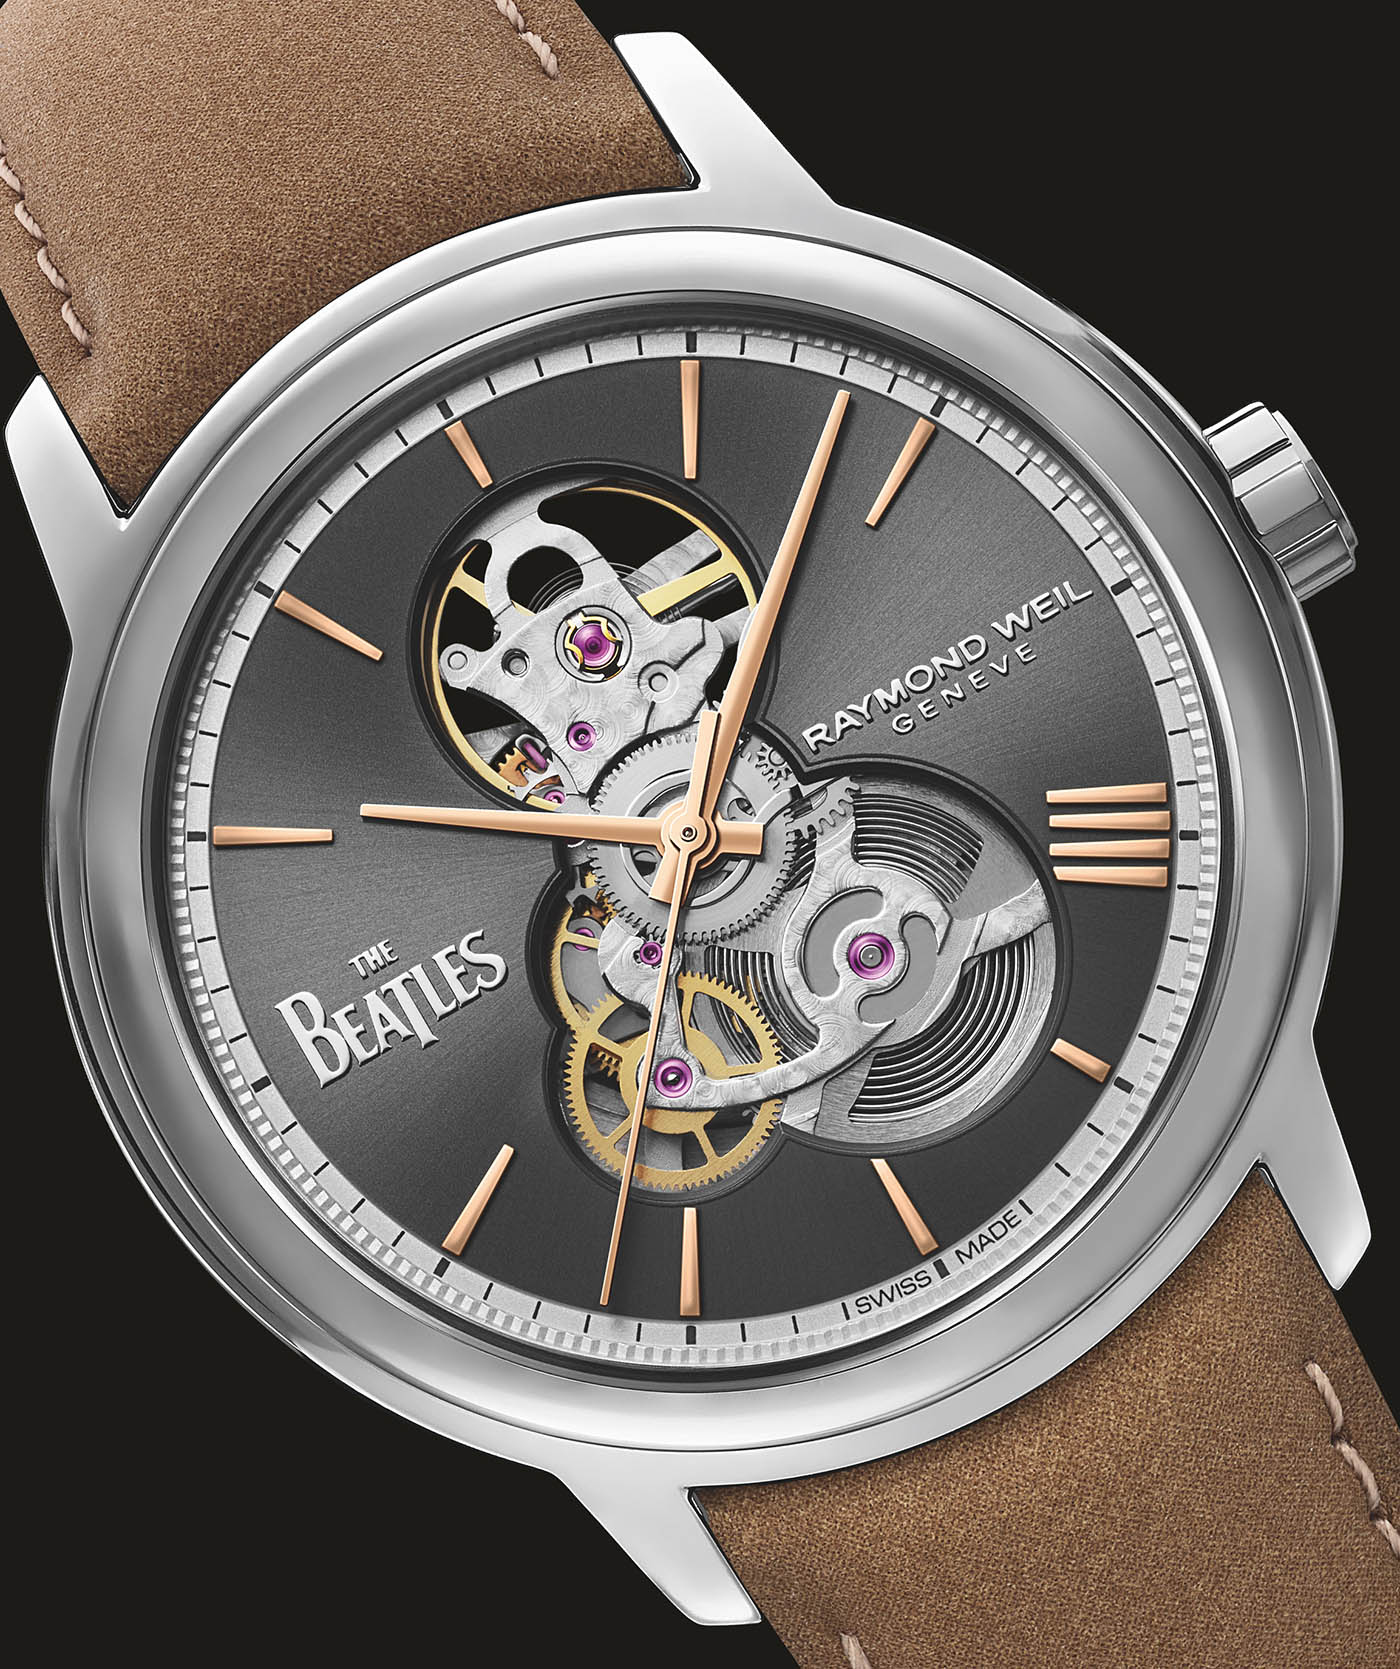 Raymond Weil представляет часы Maestro The Beatles Let It Be ограниченной серии